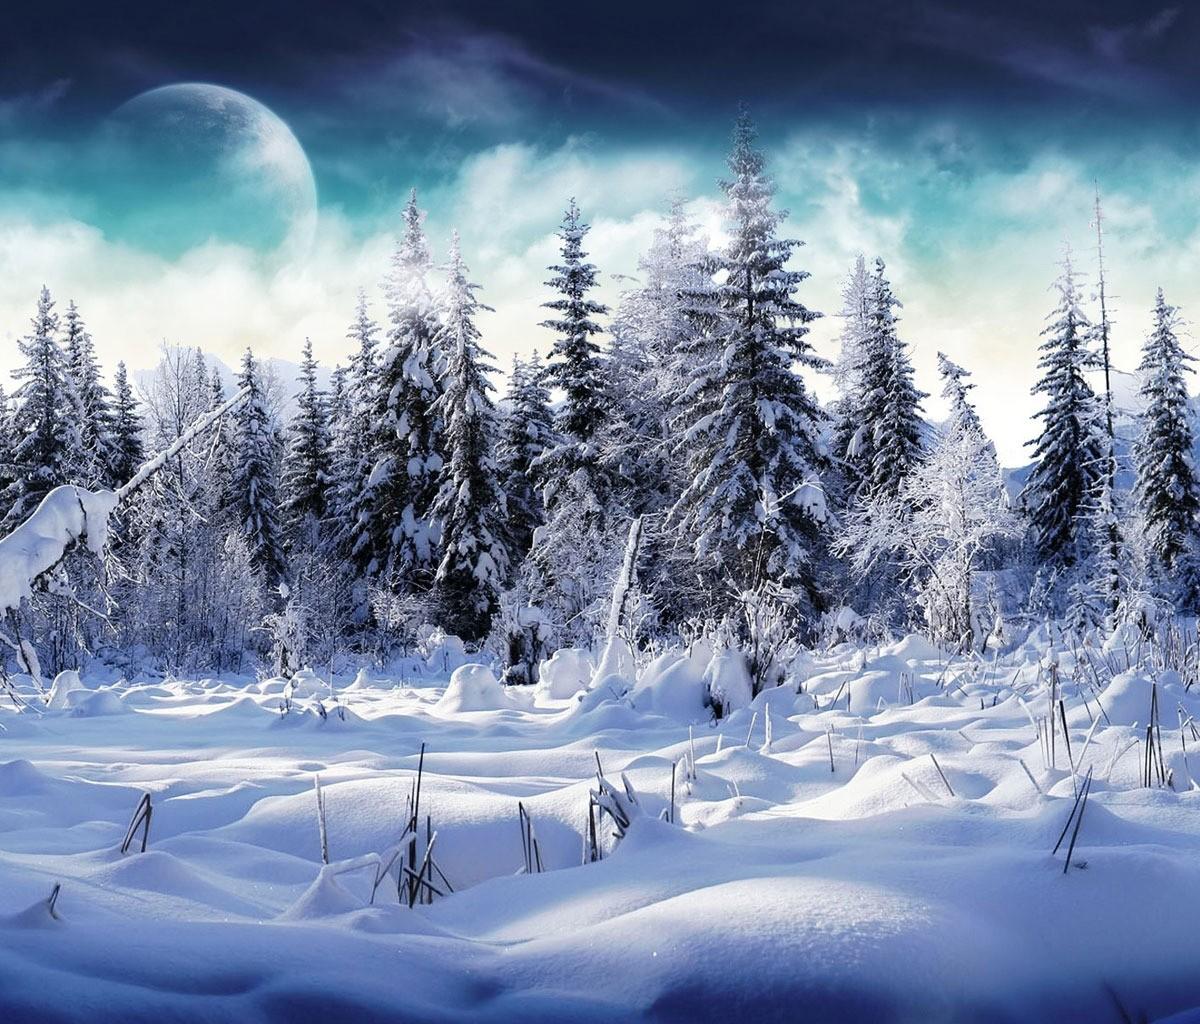 http://1.bp.blogspot.com/-D3rFIO92jwI/T6uUGR32nPI/AAAAAAAACjU/X0gTOzYkndY/s1600/Tablet-snowy-trees-1200x1024.jpg